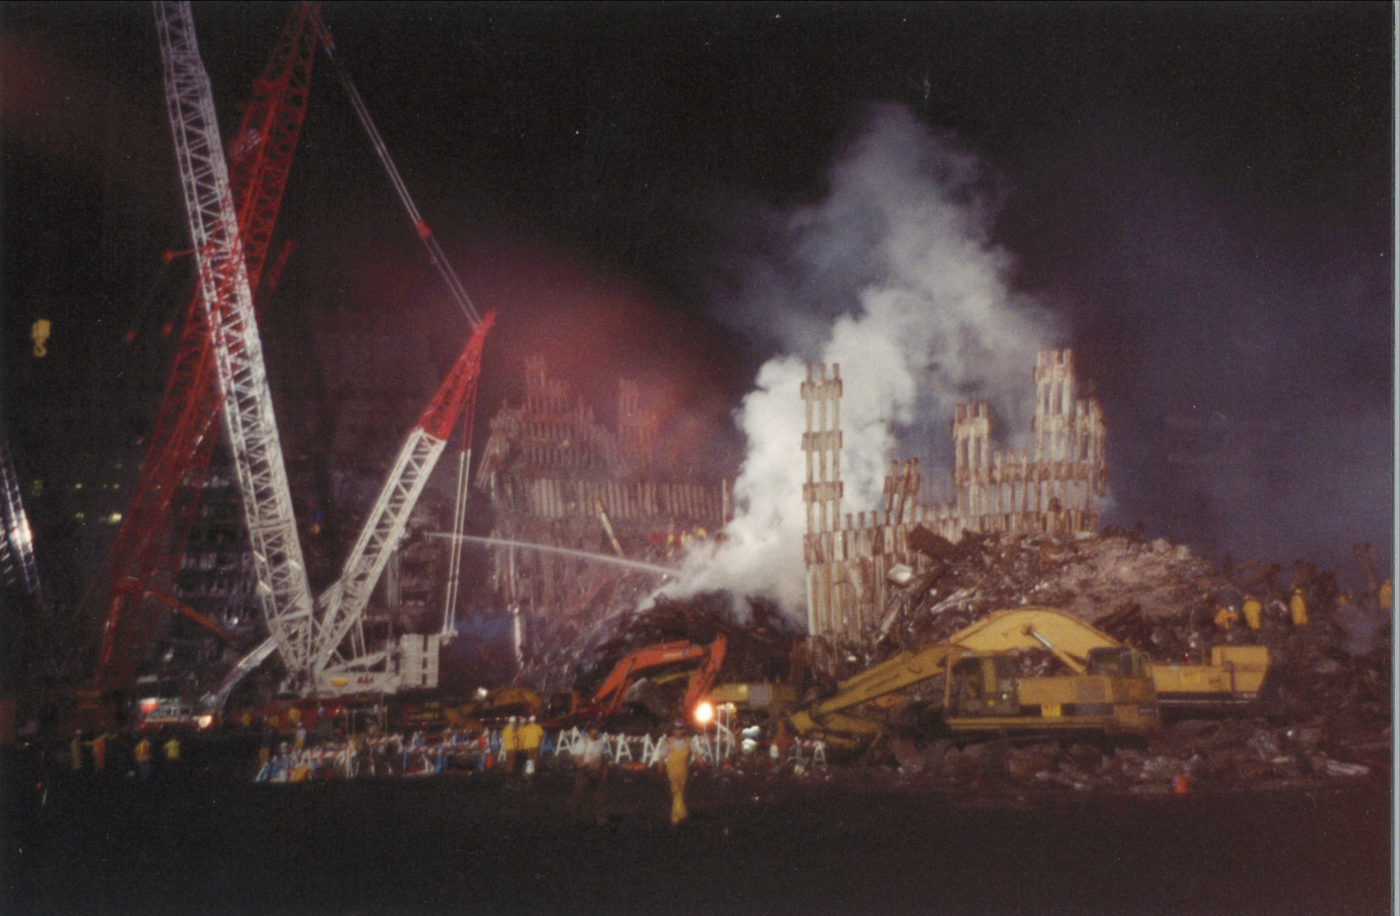 Cranes and Diggers beside Smoke Rising through destroyed Exoskeleton